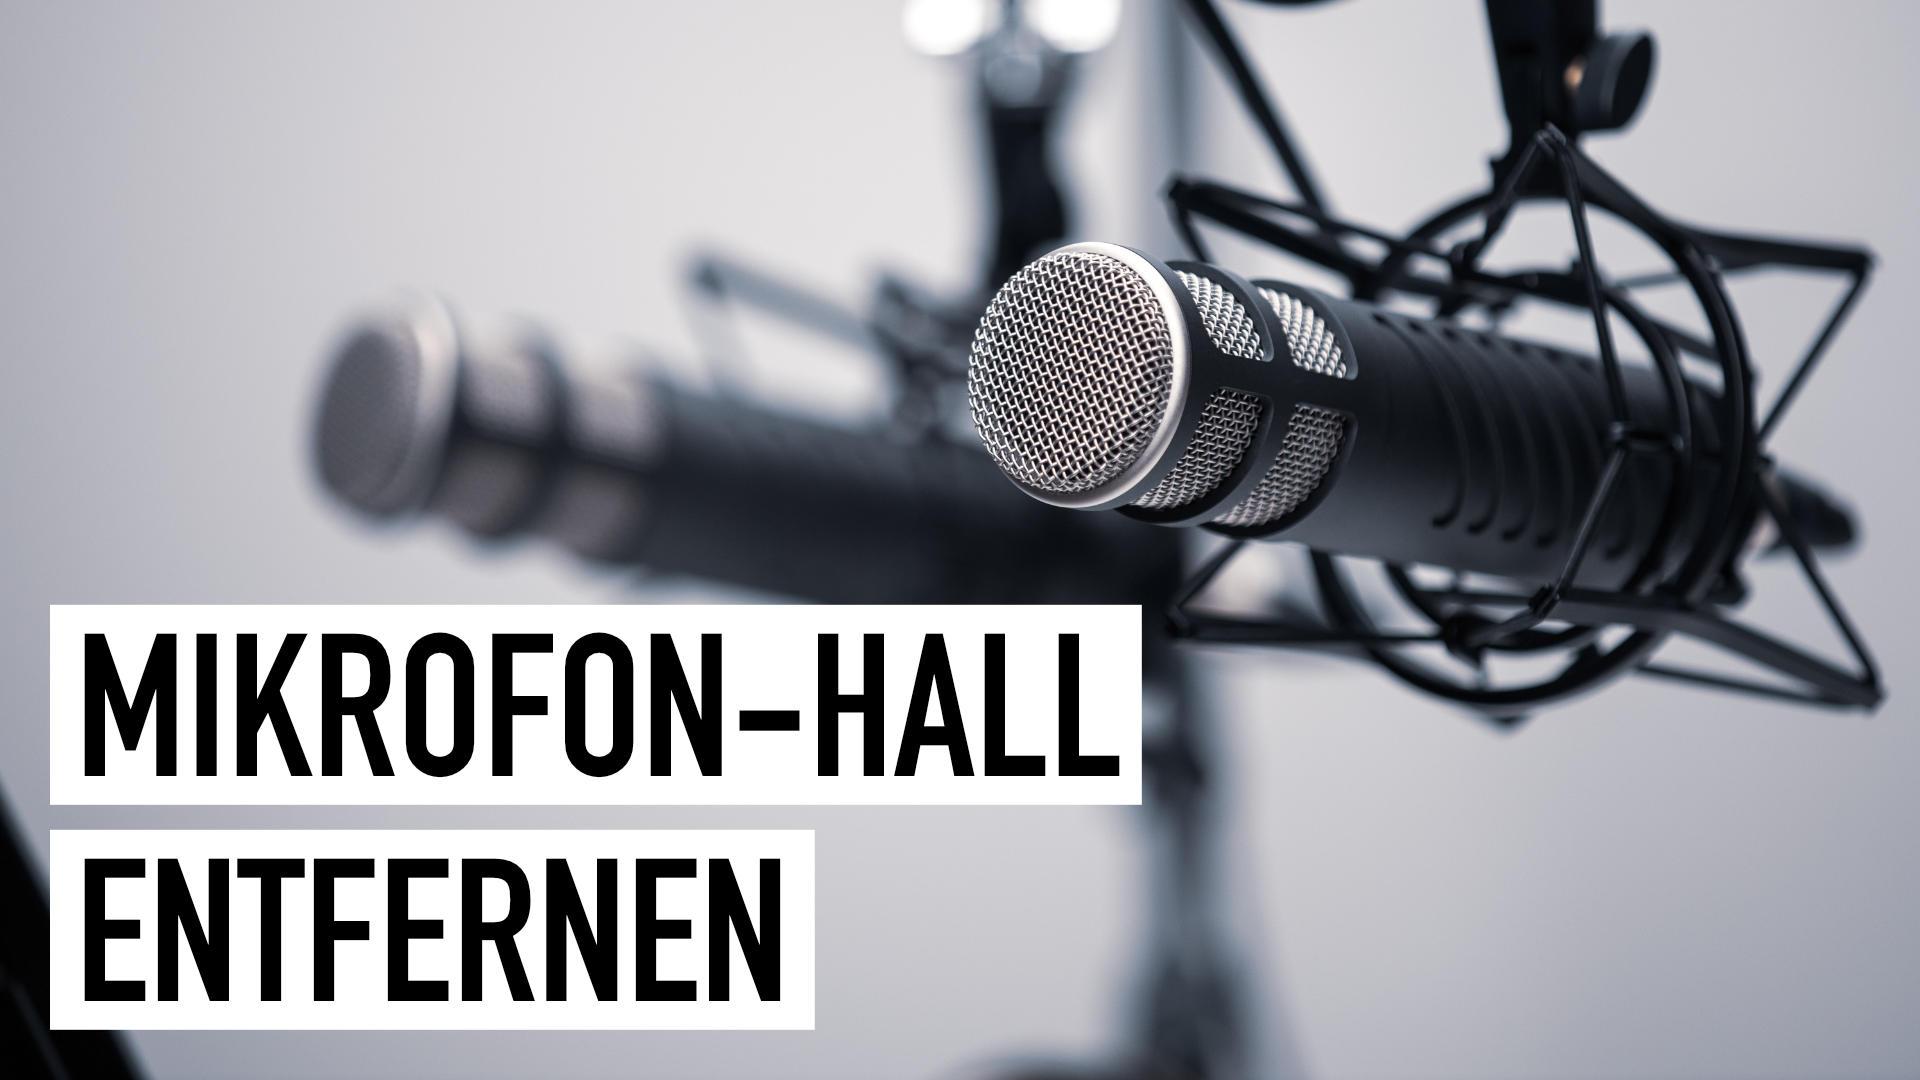 Mikrofon-Hall entfernen